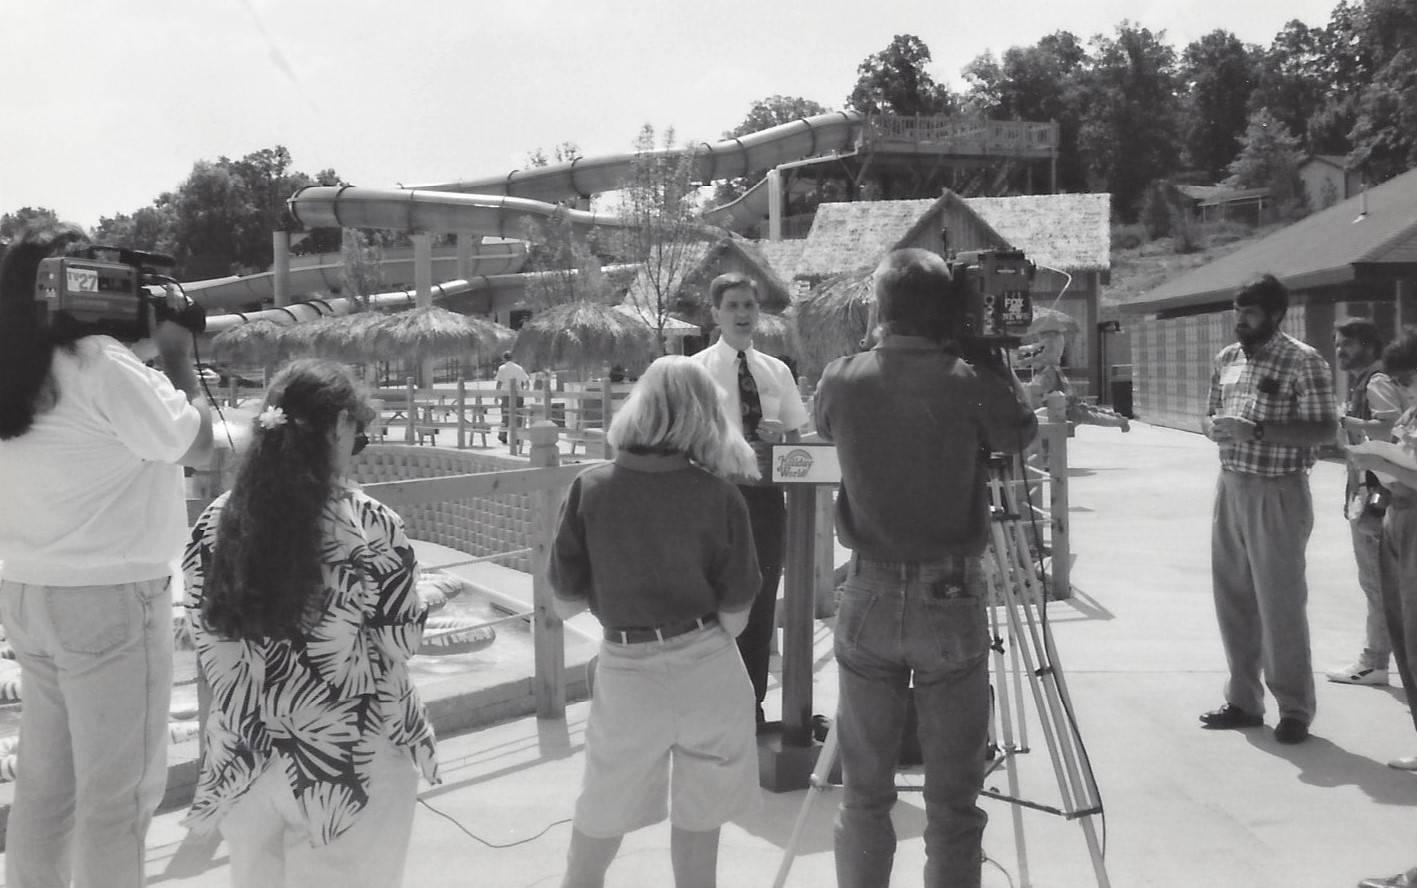 Shows Will Koch on opening day of Splashin' Safari in 1993